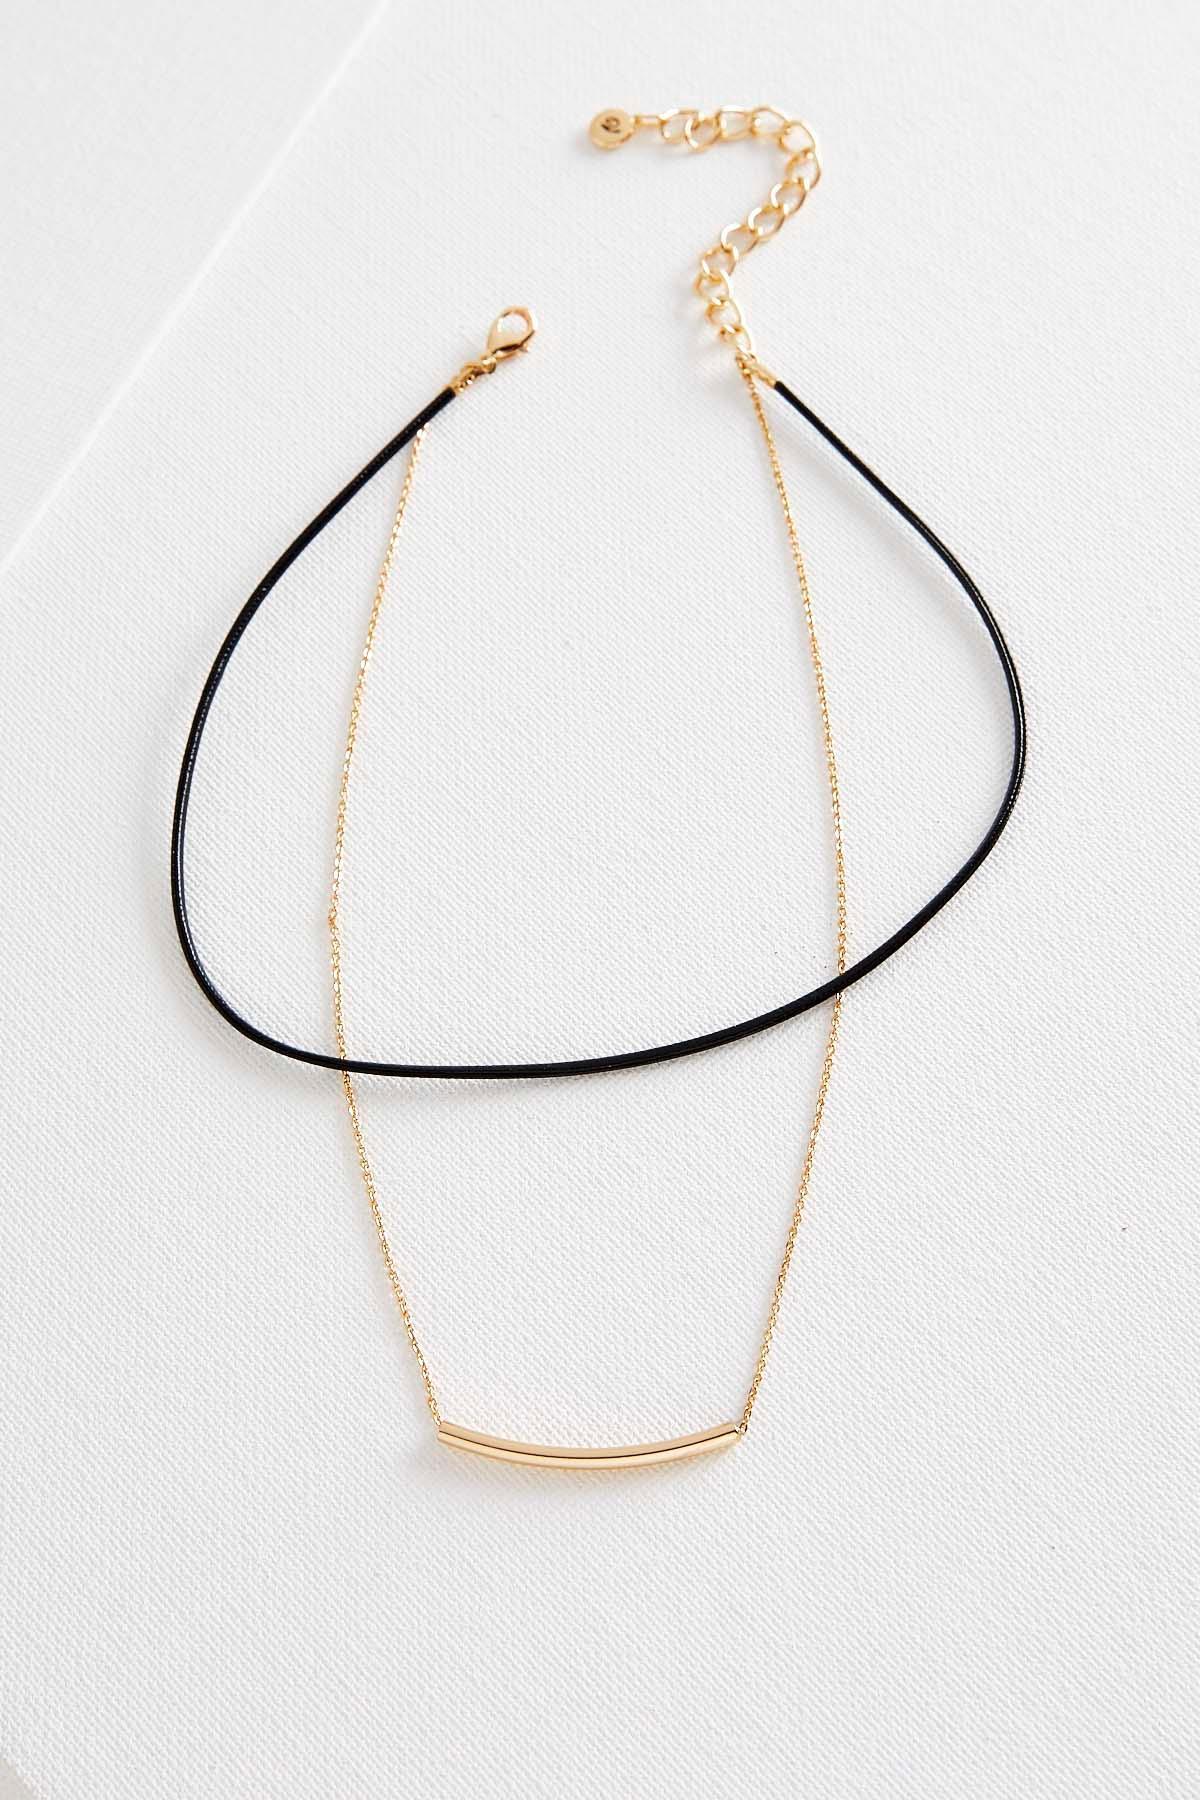 Layered Chain Cord Choker